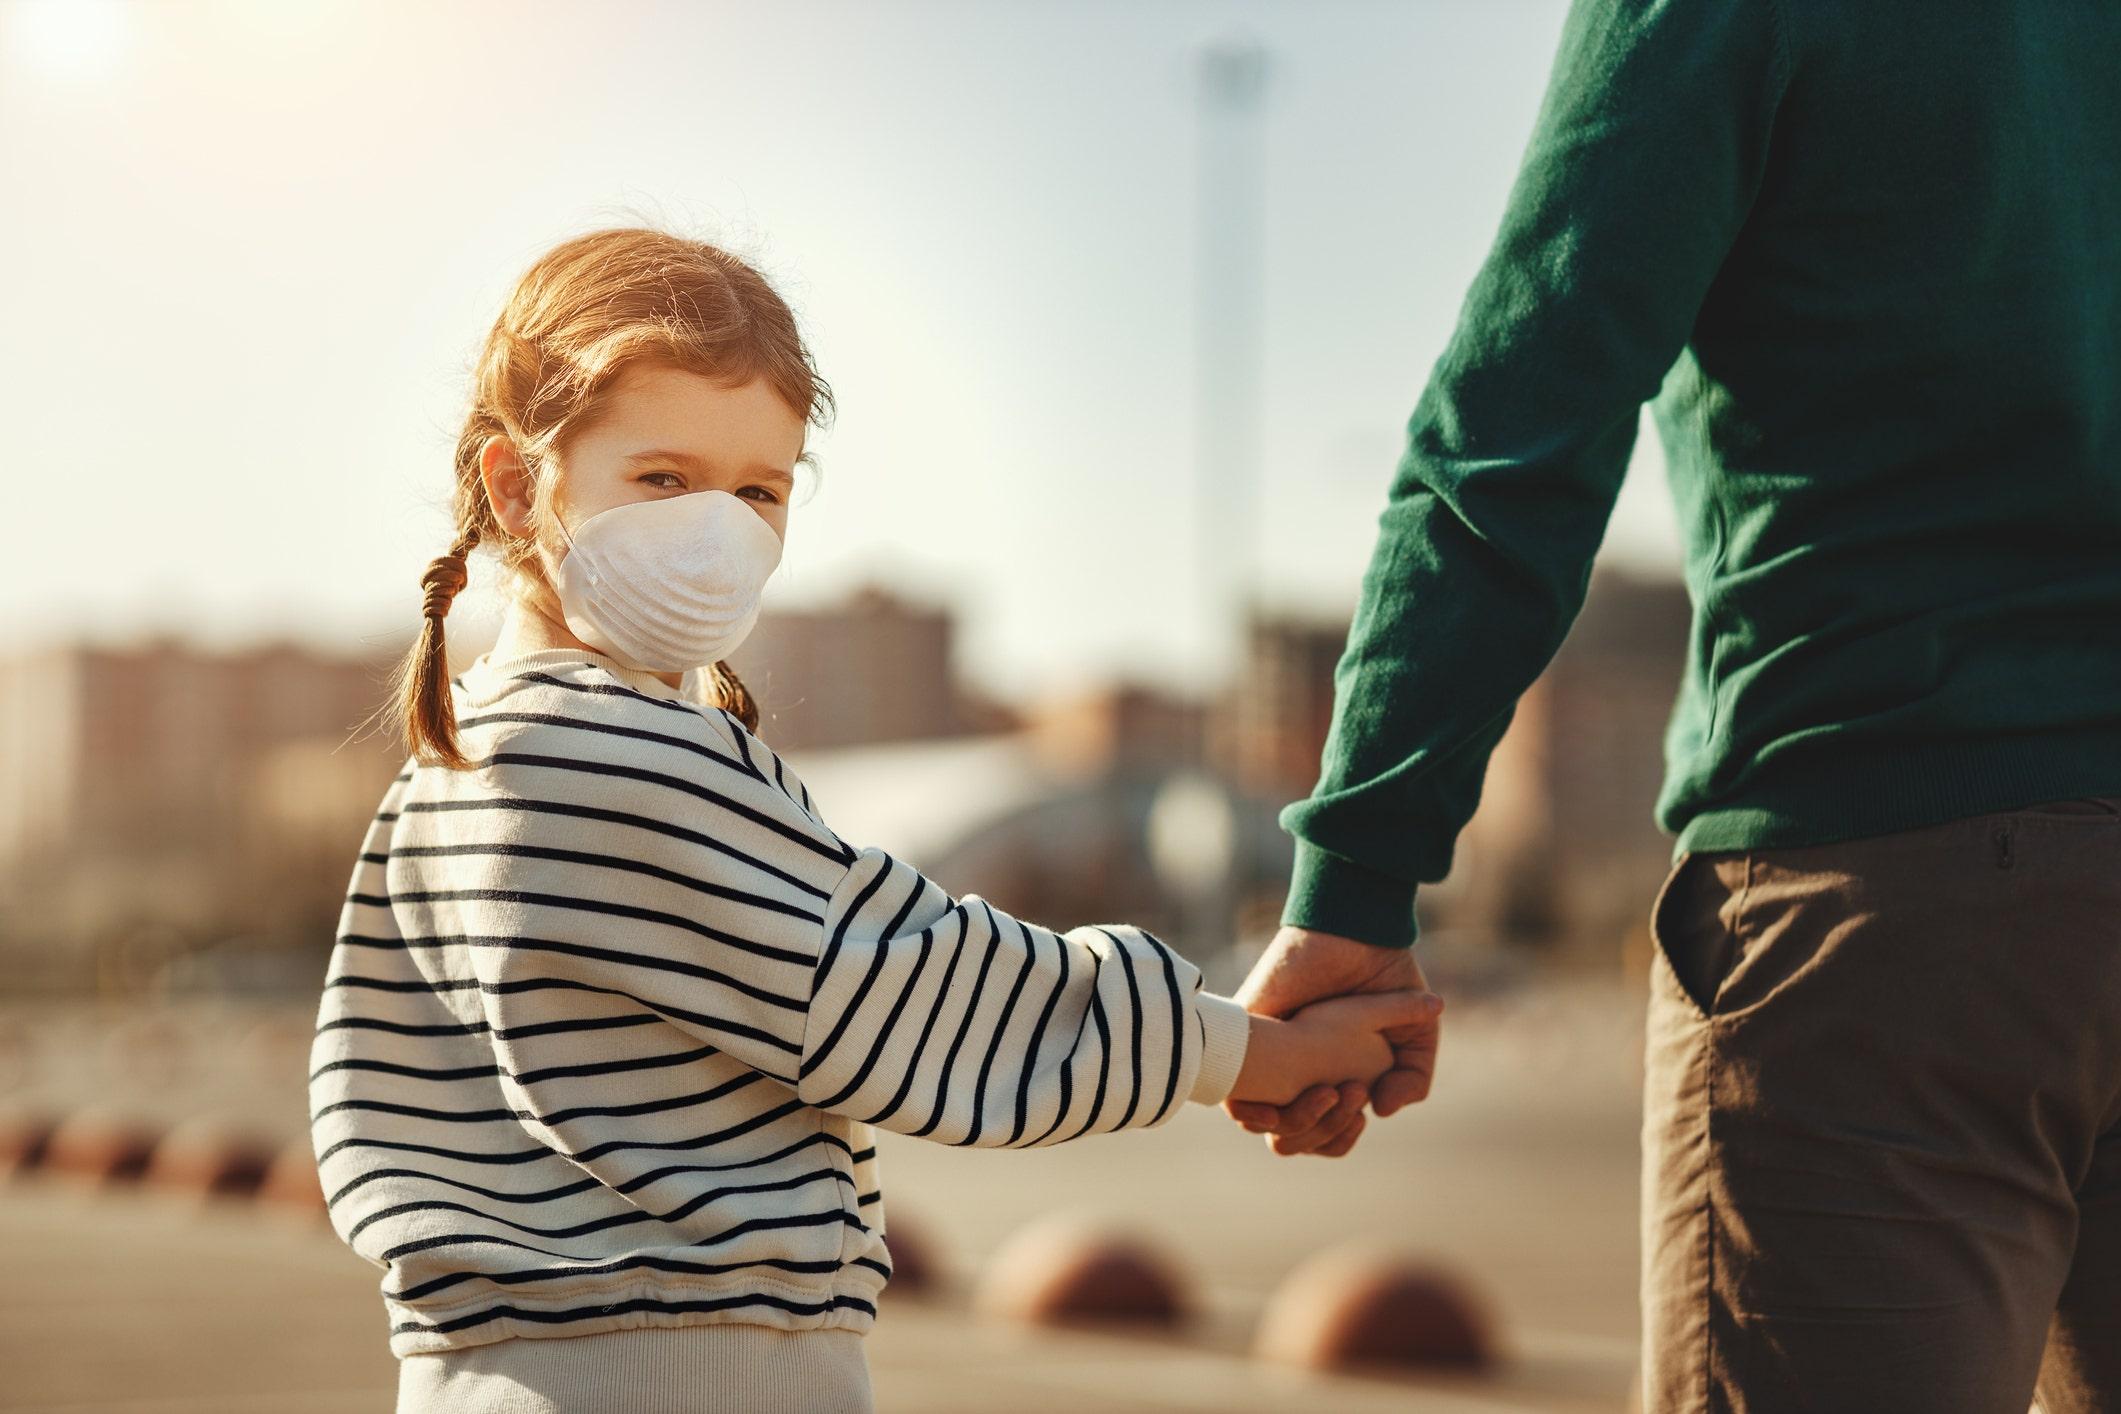 Doctors warn against comparing COVID-19, seasonal flu while kids await vaccine